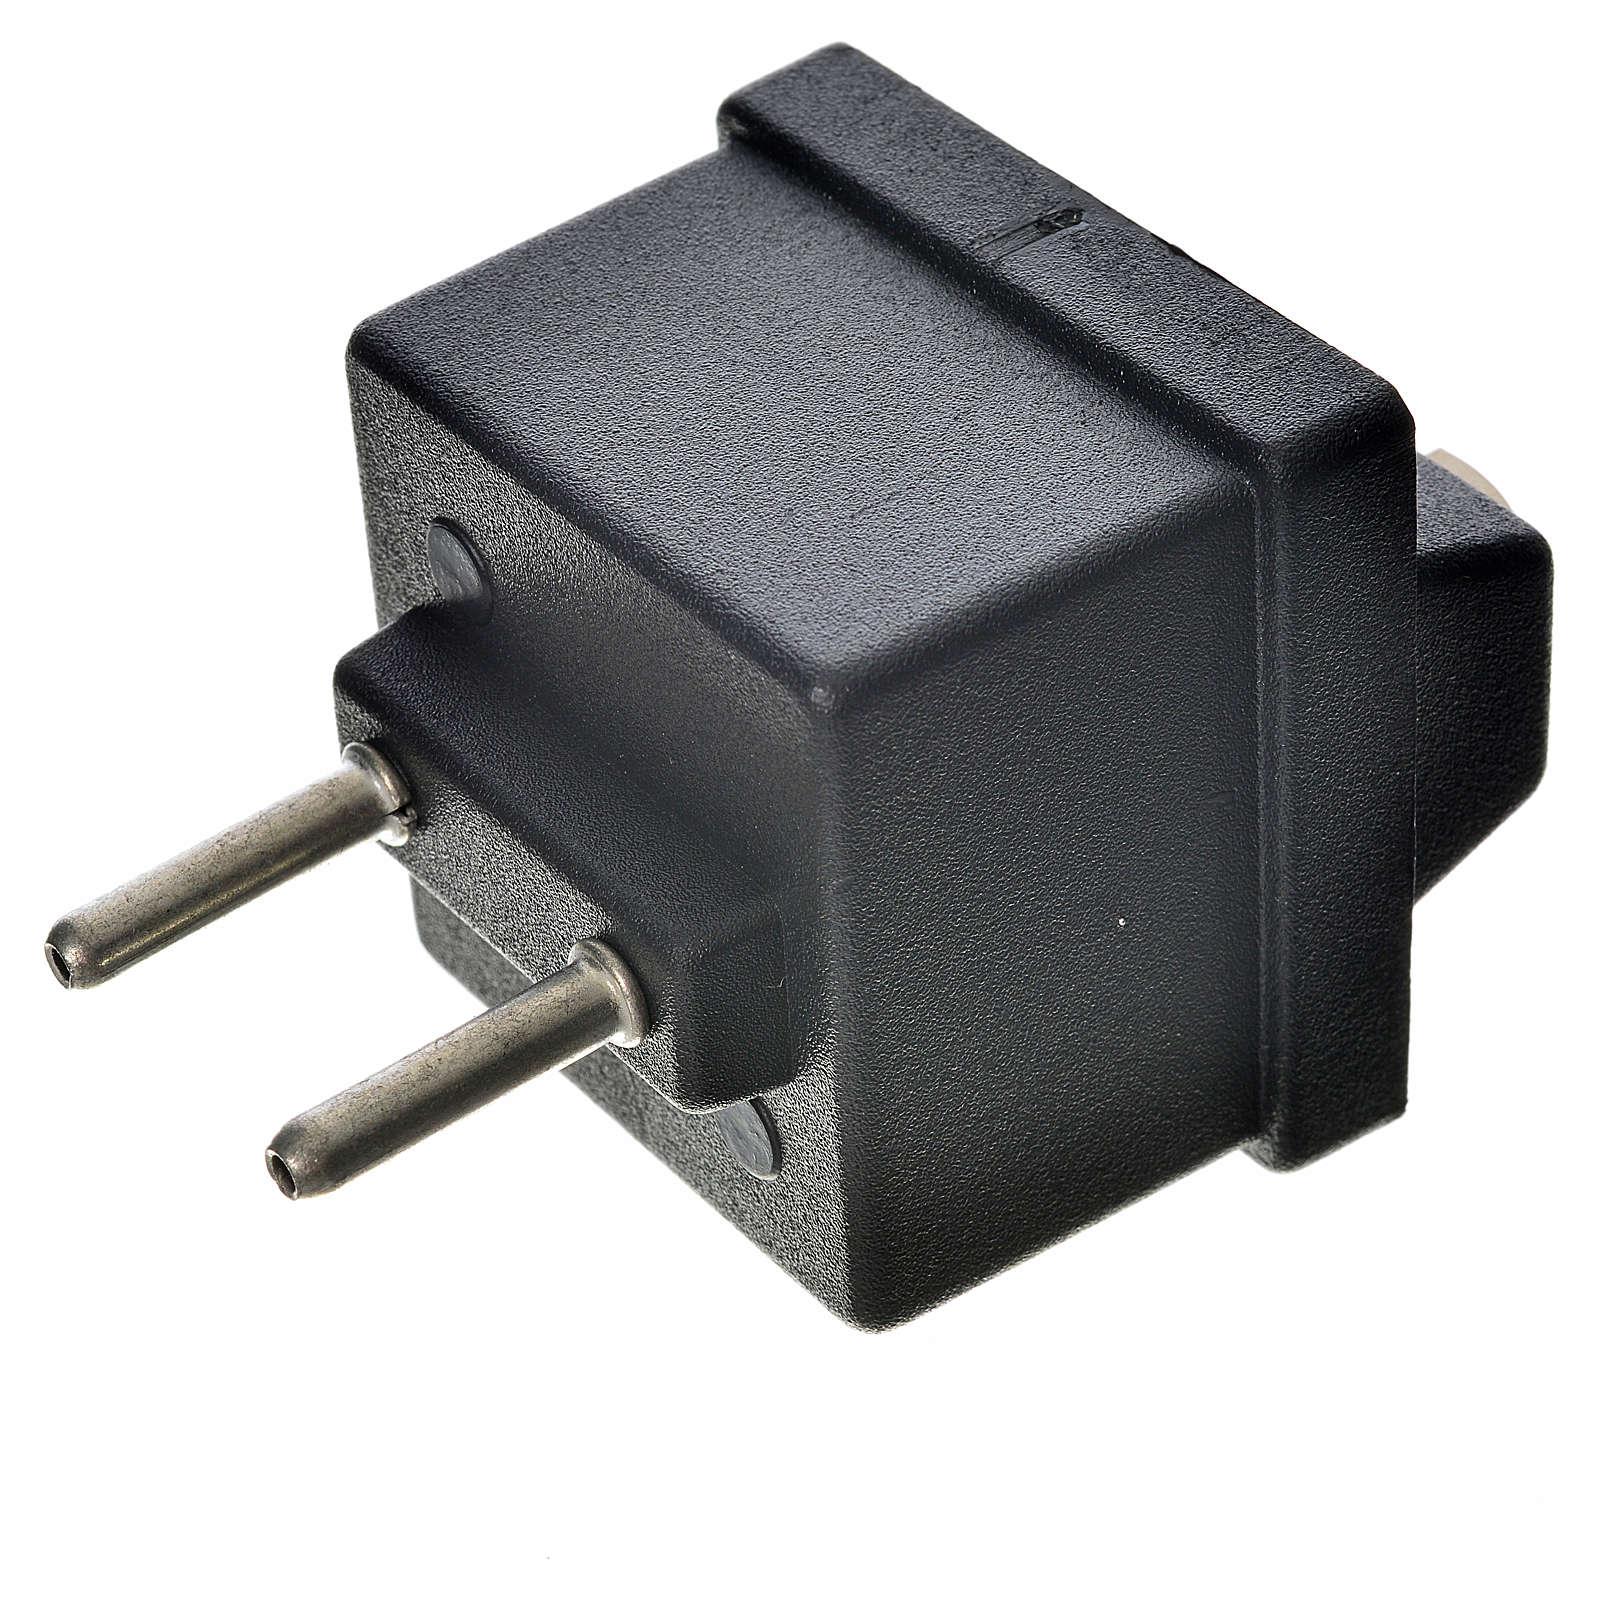 Alimentatore Led di potenza per spot PWSB (Frialpower) 4